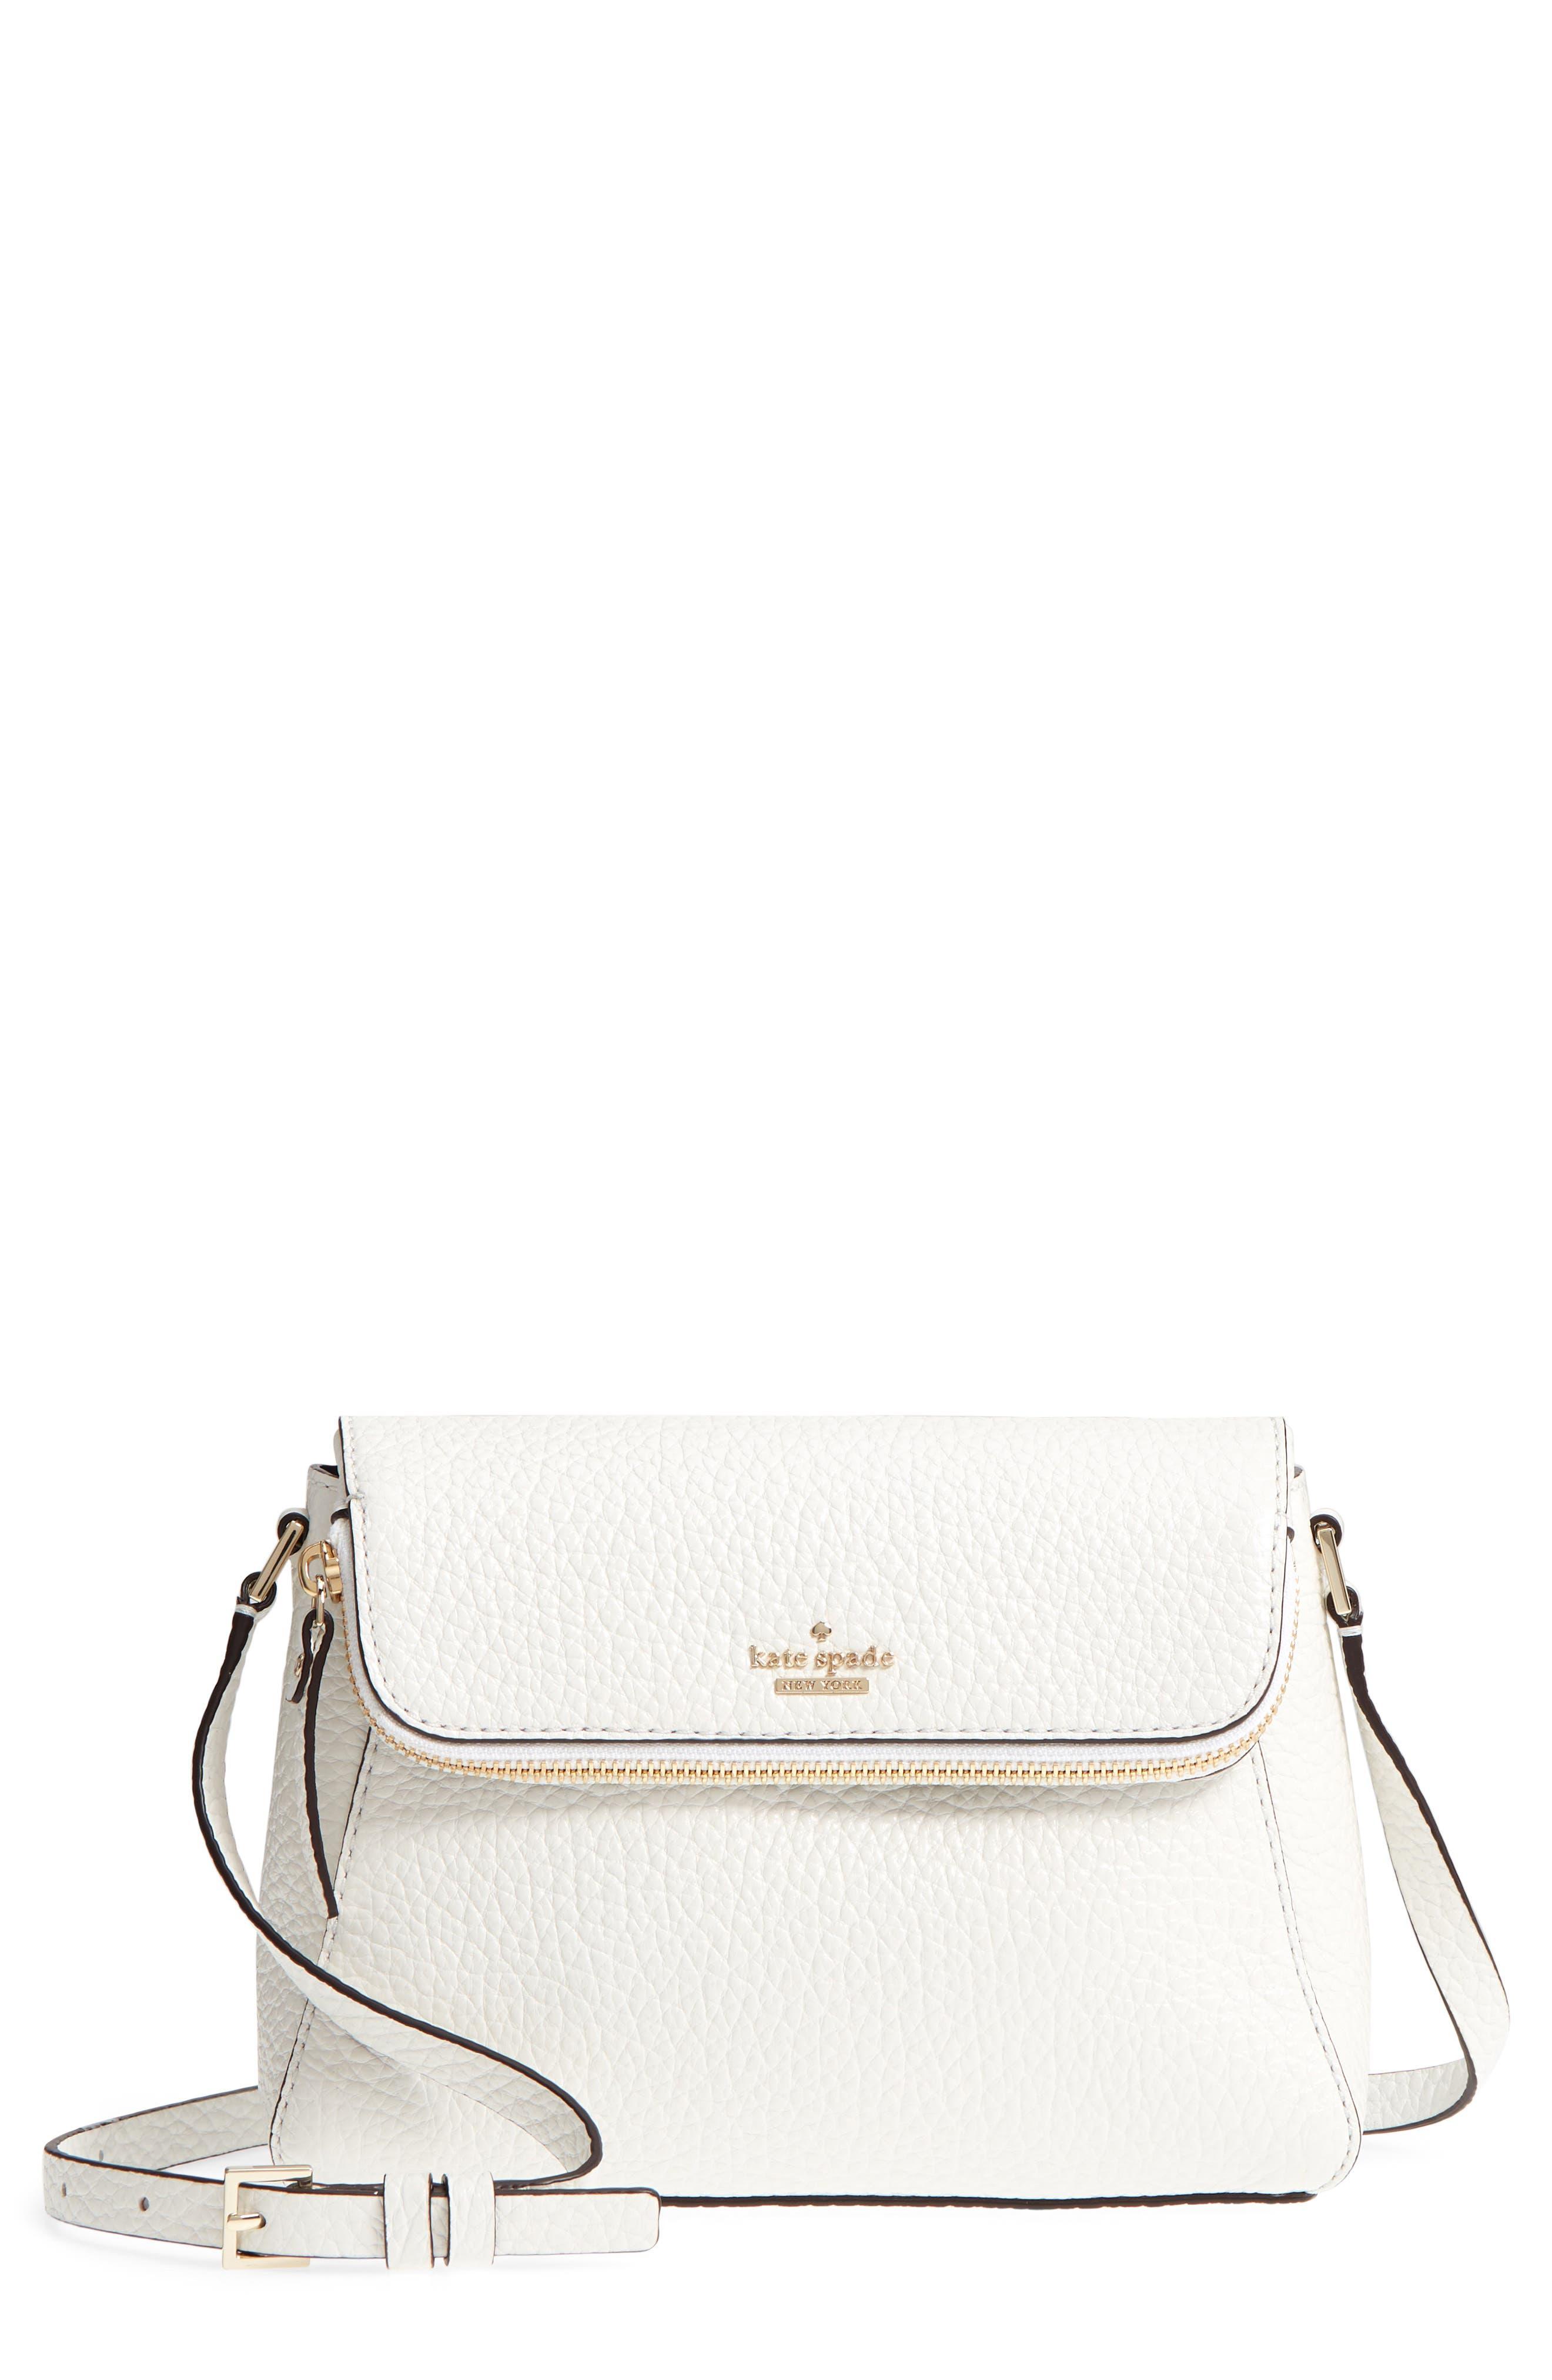 carter street - berrin leather crossbody bag,                             Main thumbnail 1, color,                             100